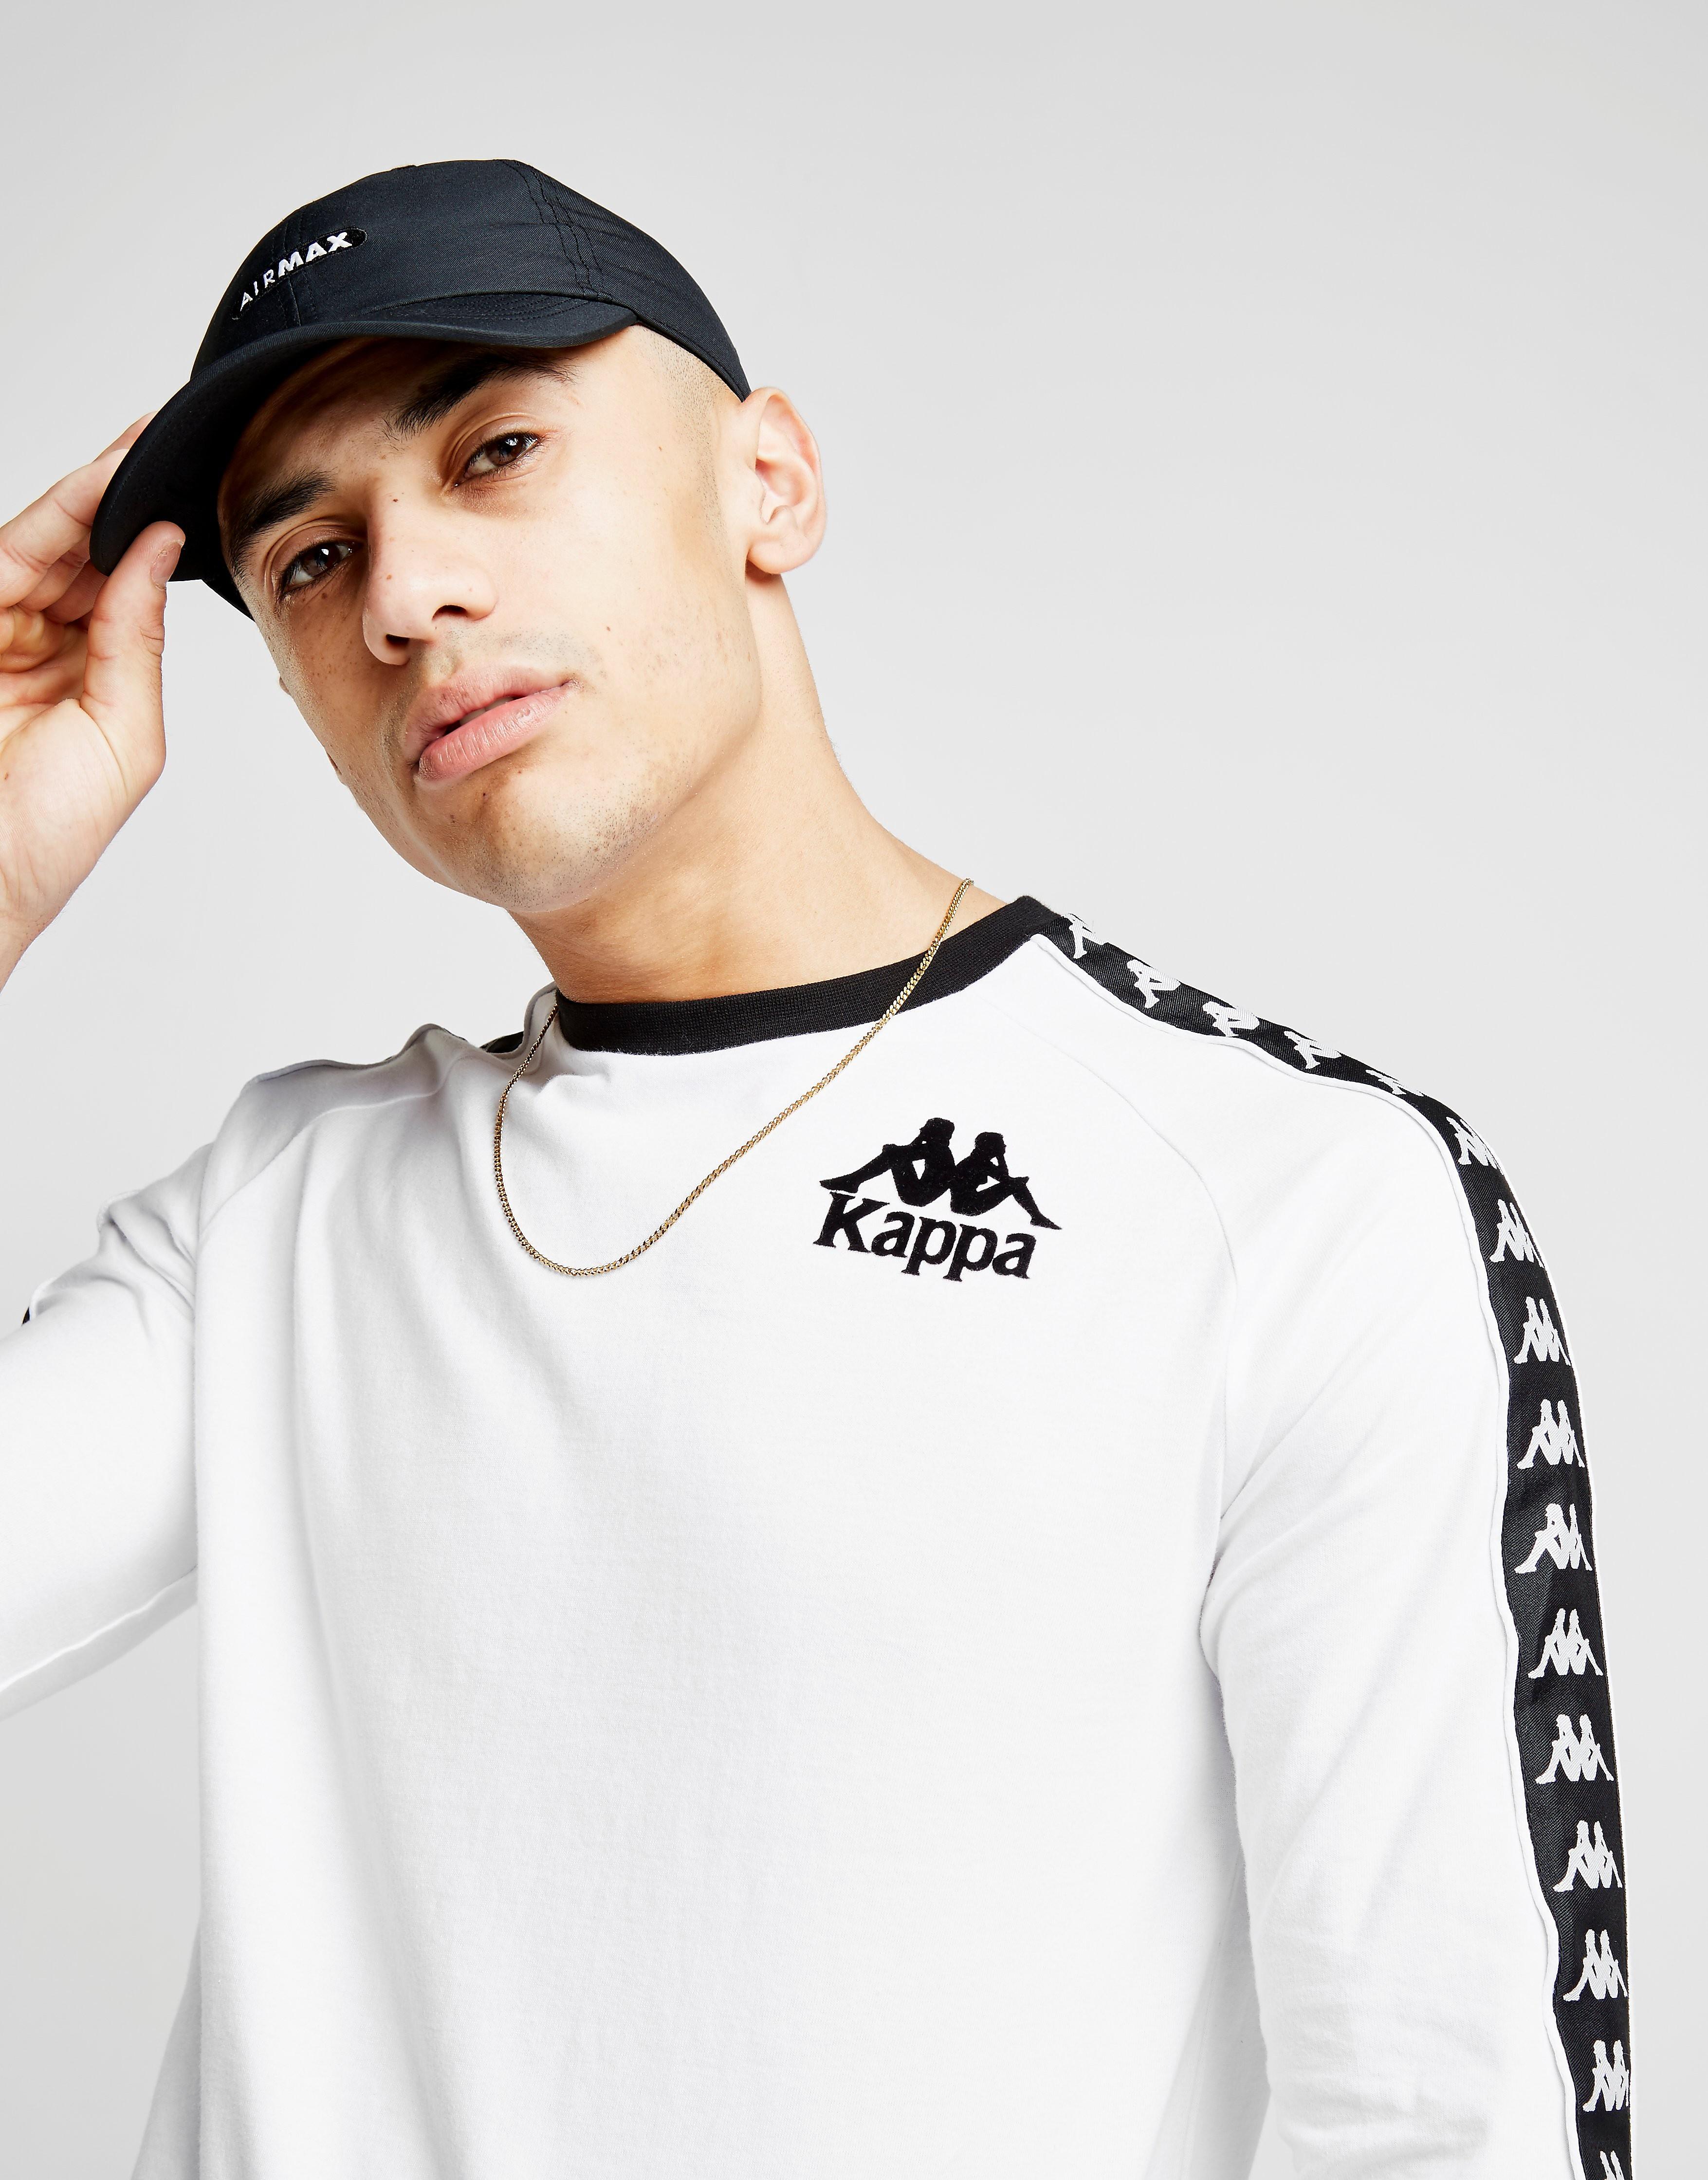 Kappa Authentic Dixon Long Sleeve T-Shirt